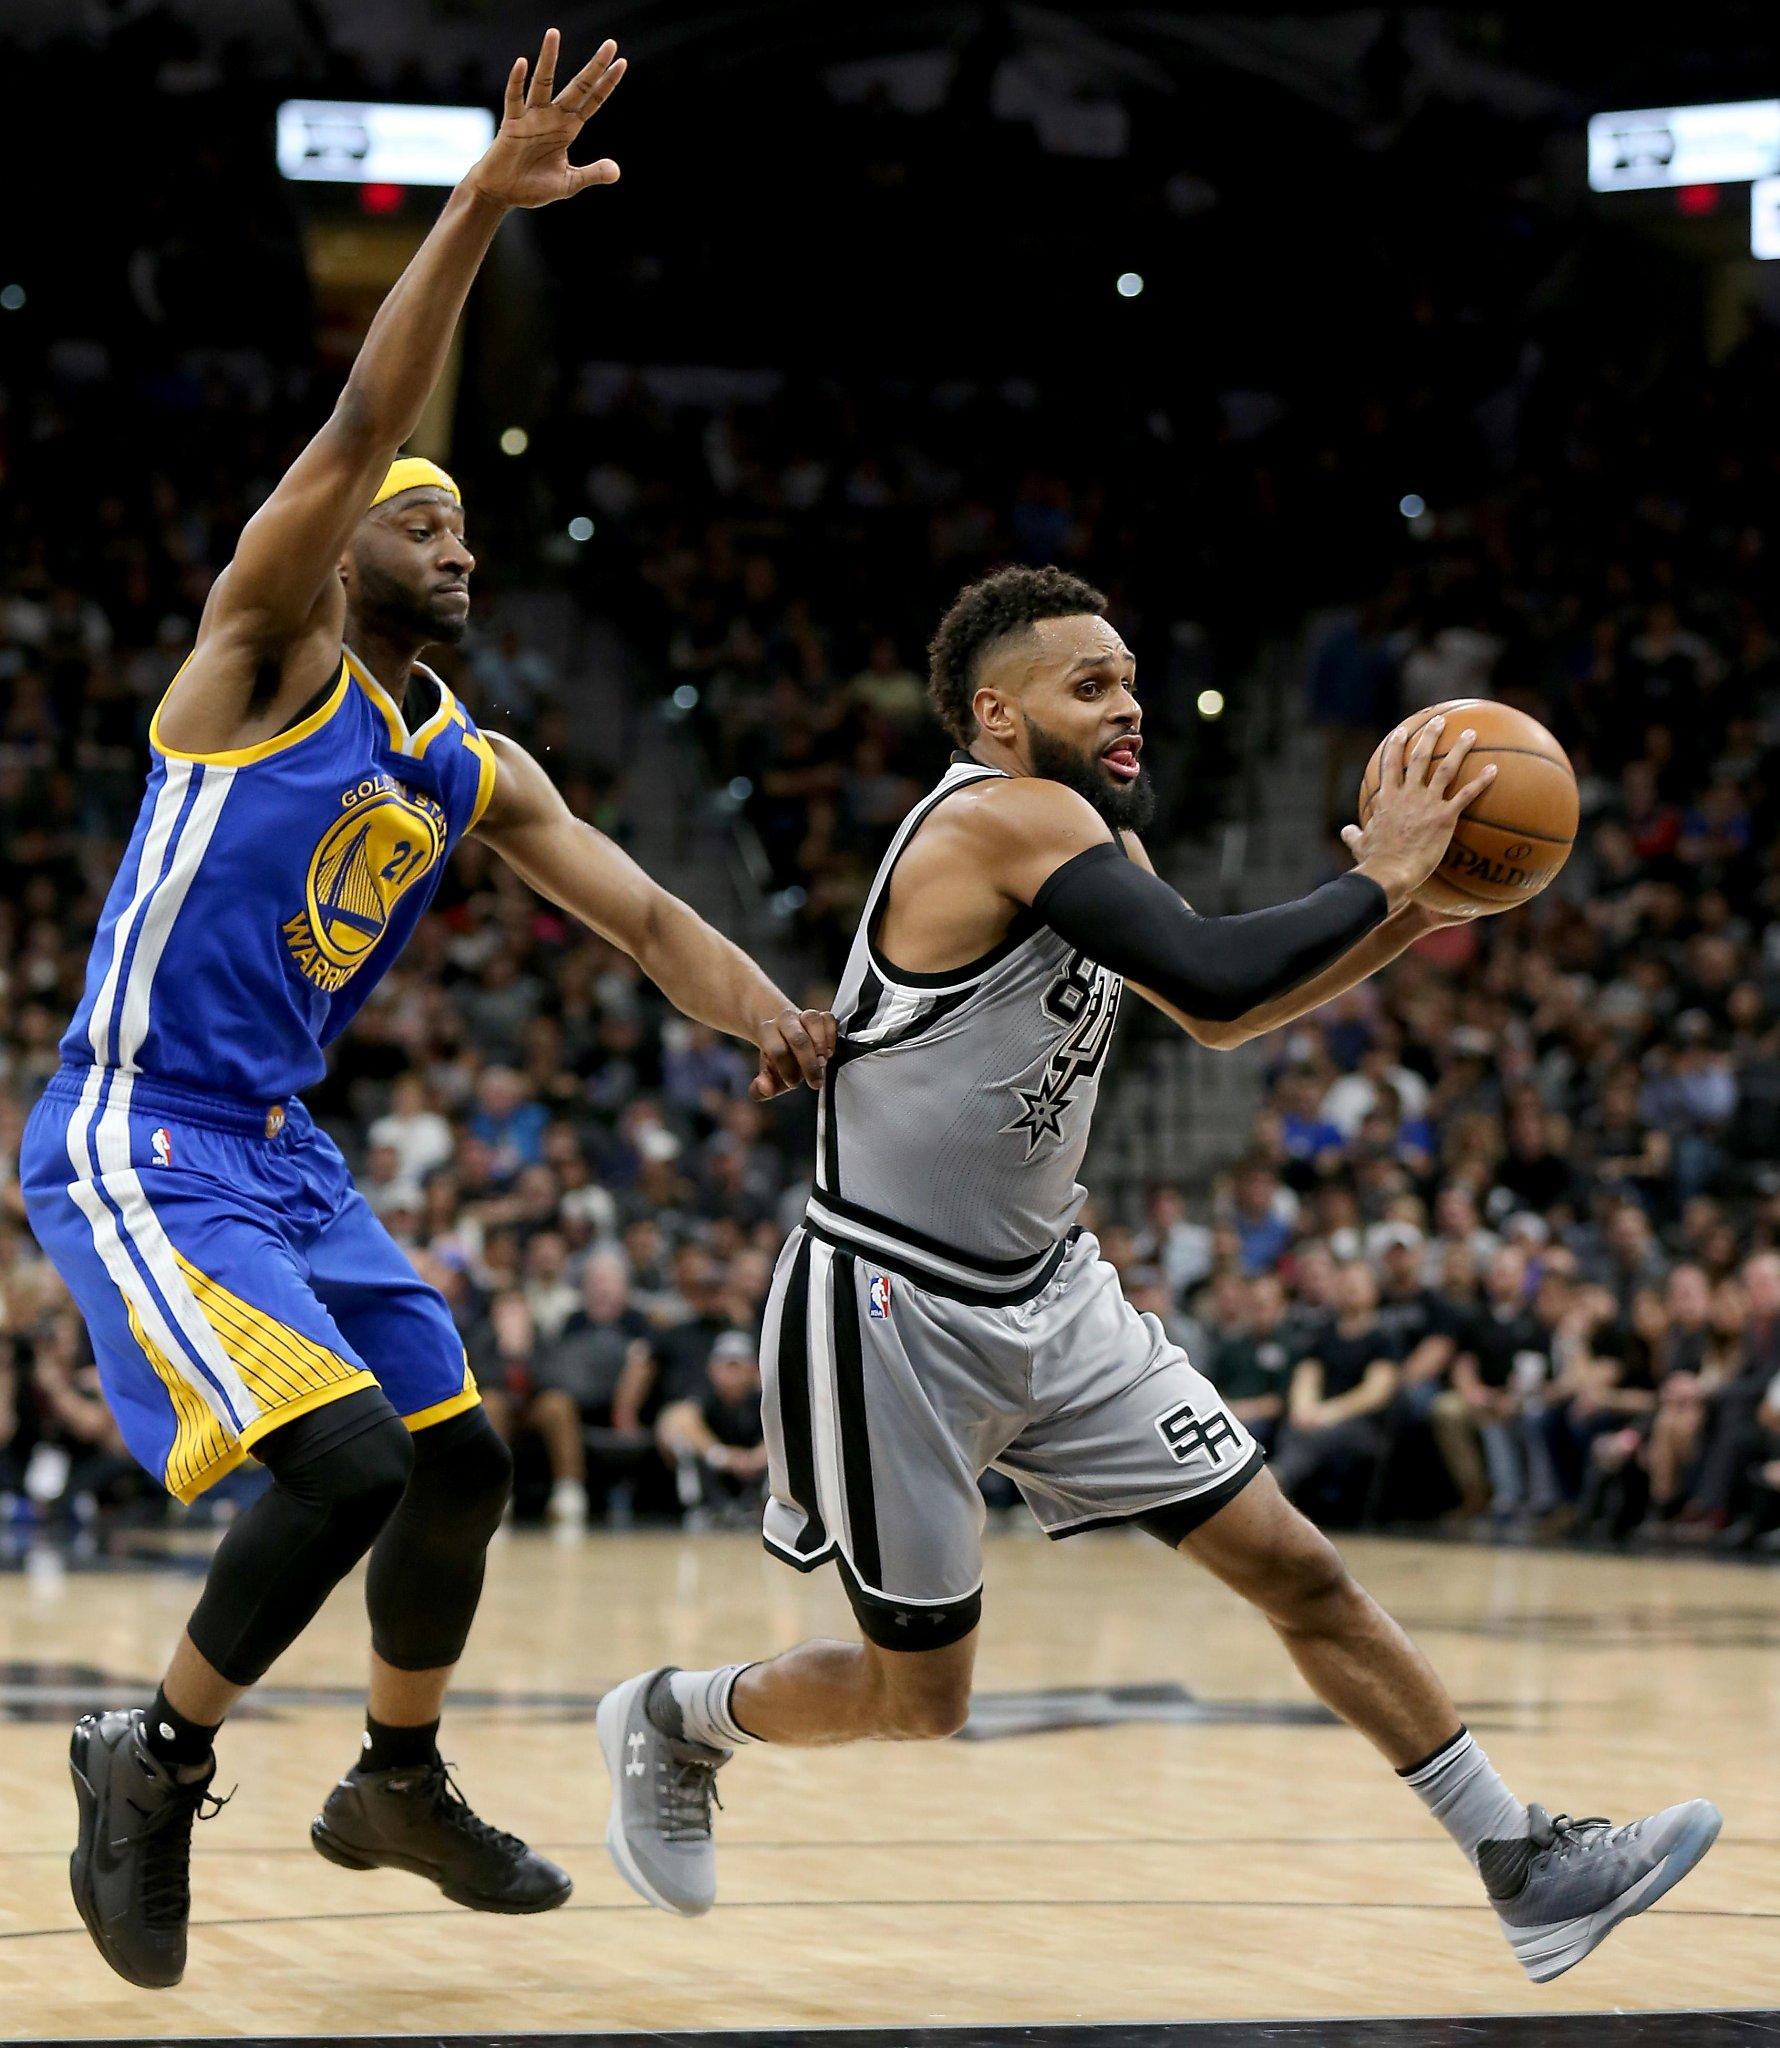 Spurs First Team Players Squad: Warriors' B Team No Match For Spurs